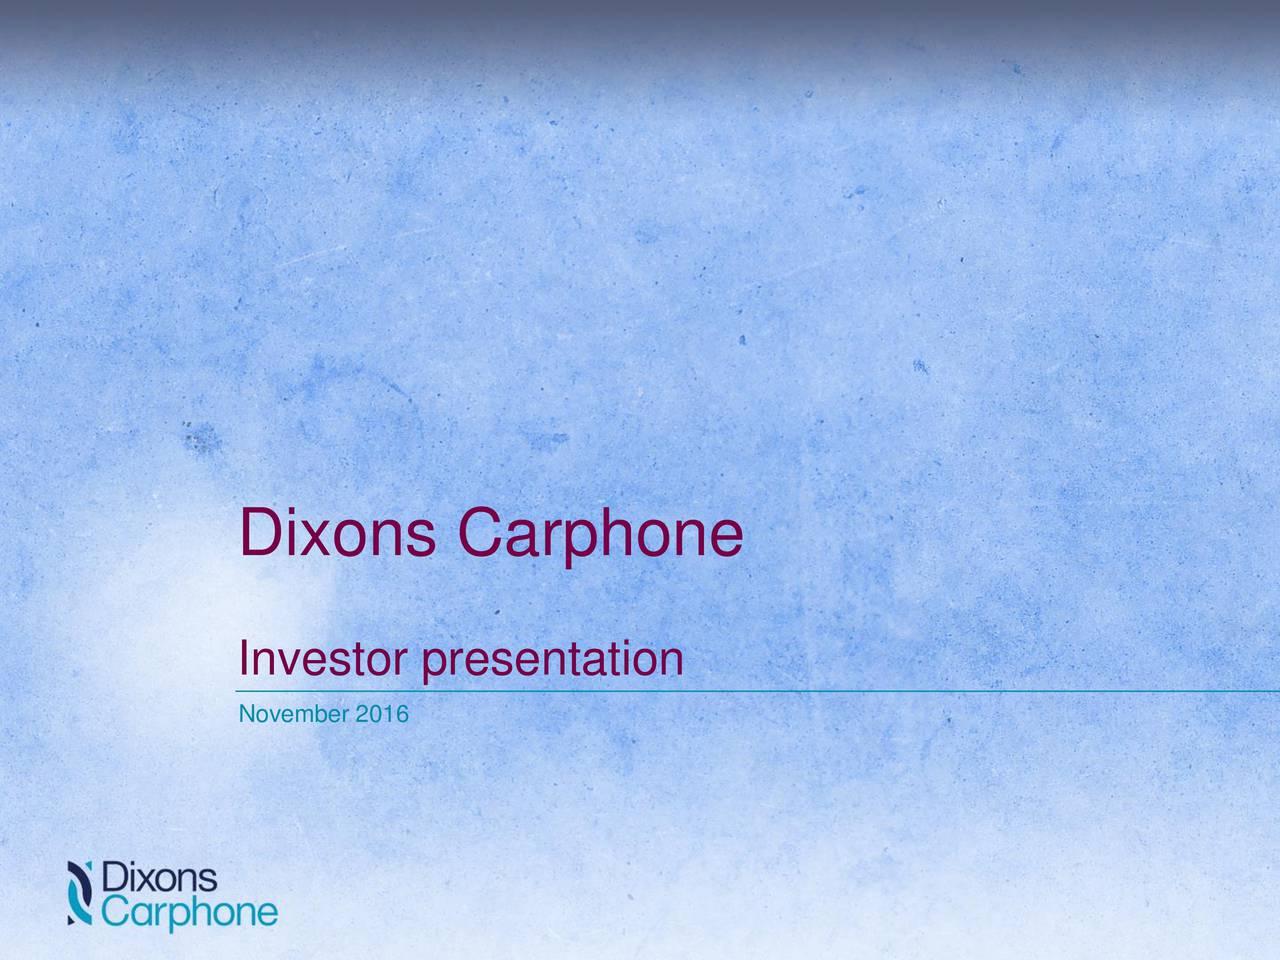 Investor presentation November 2016